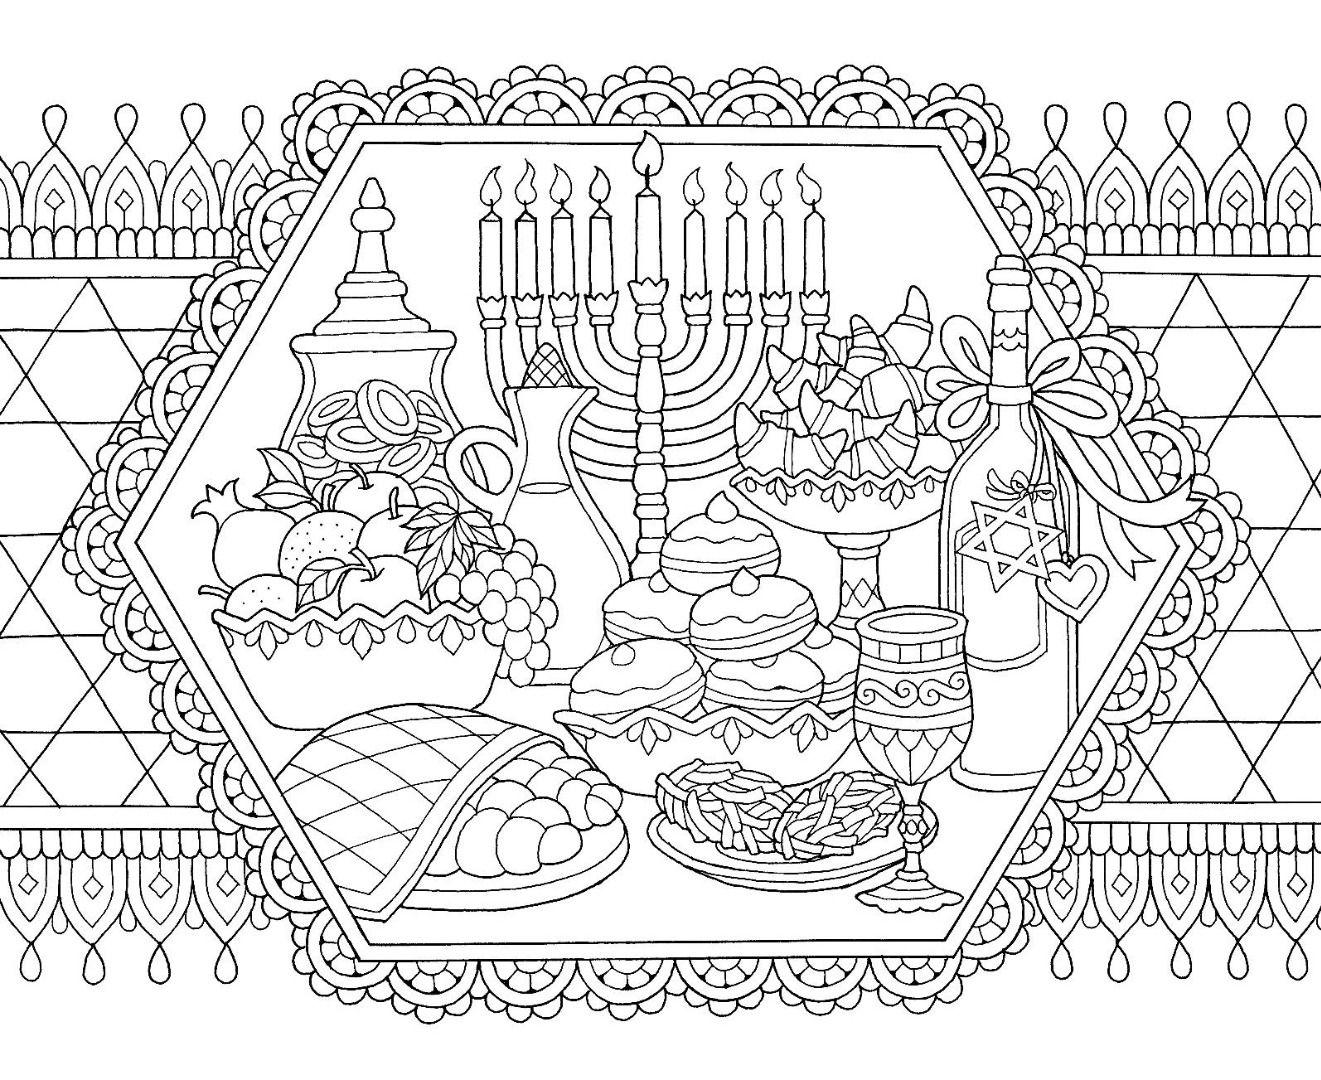 Hanukkah Feast Coloring Page Coloring pages, Hanukkah